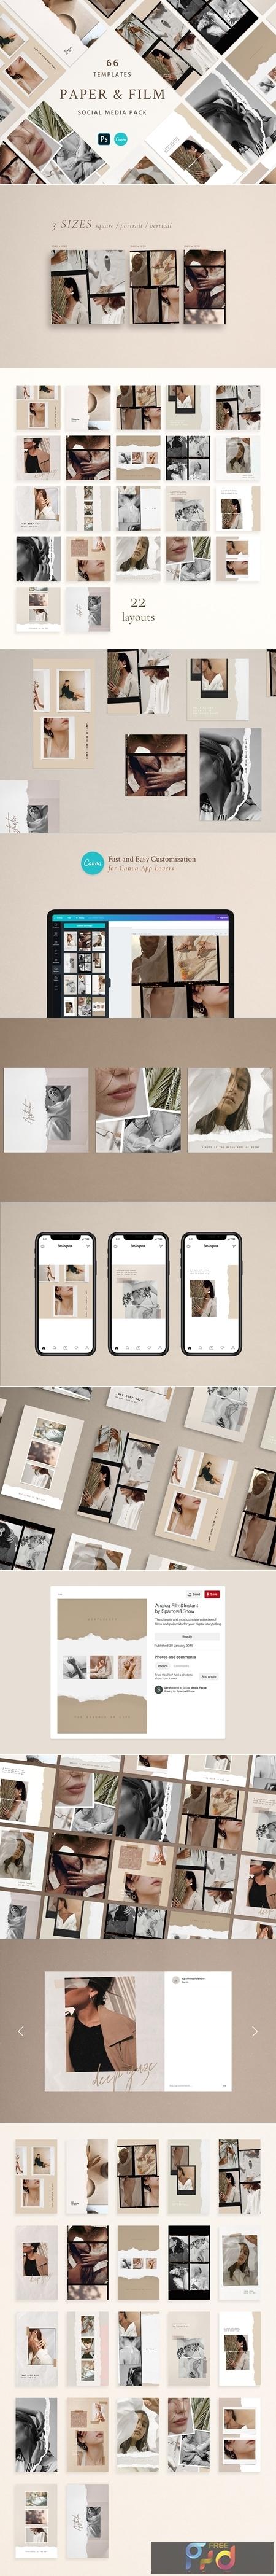 Paper and Film Social Kit 4539877 1